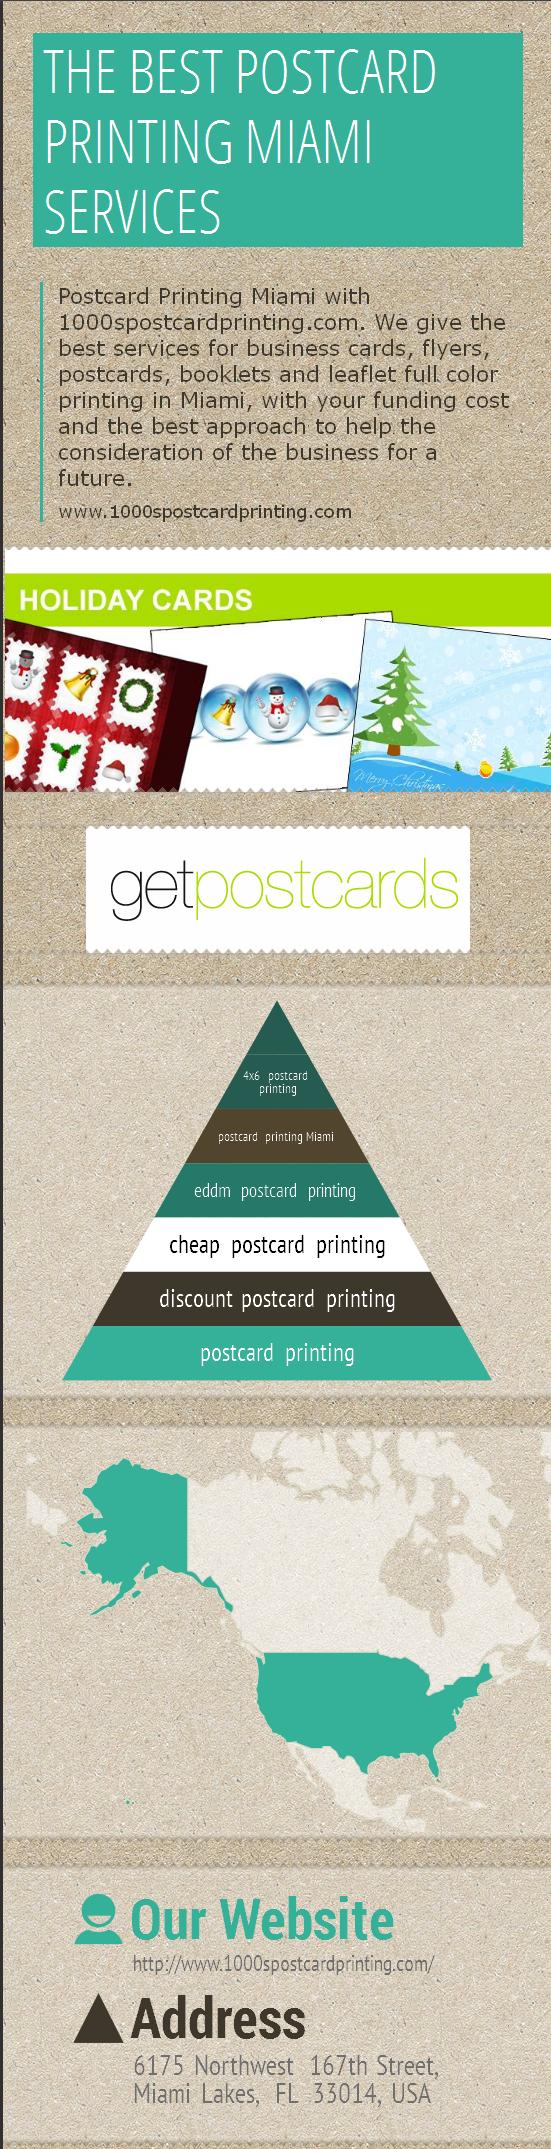 Postcard Printing Miami with 1000spostcardprinting.com. We give ...